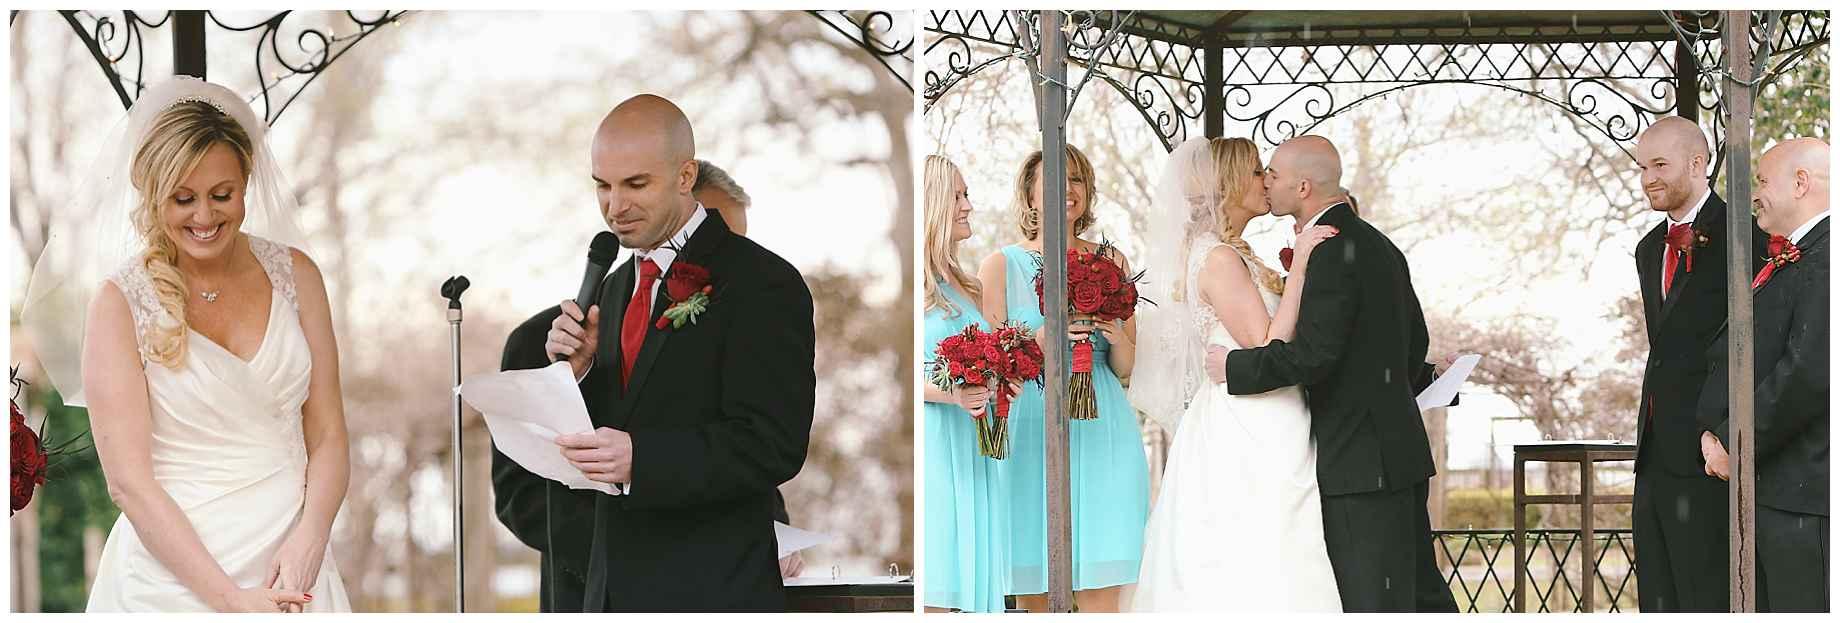 elmwood-gardens-wedding-photos-12